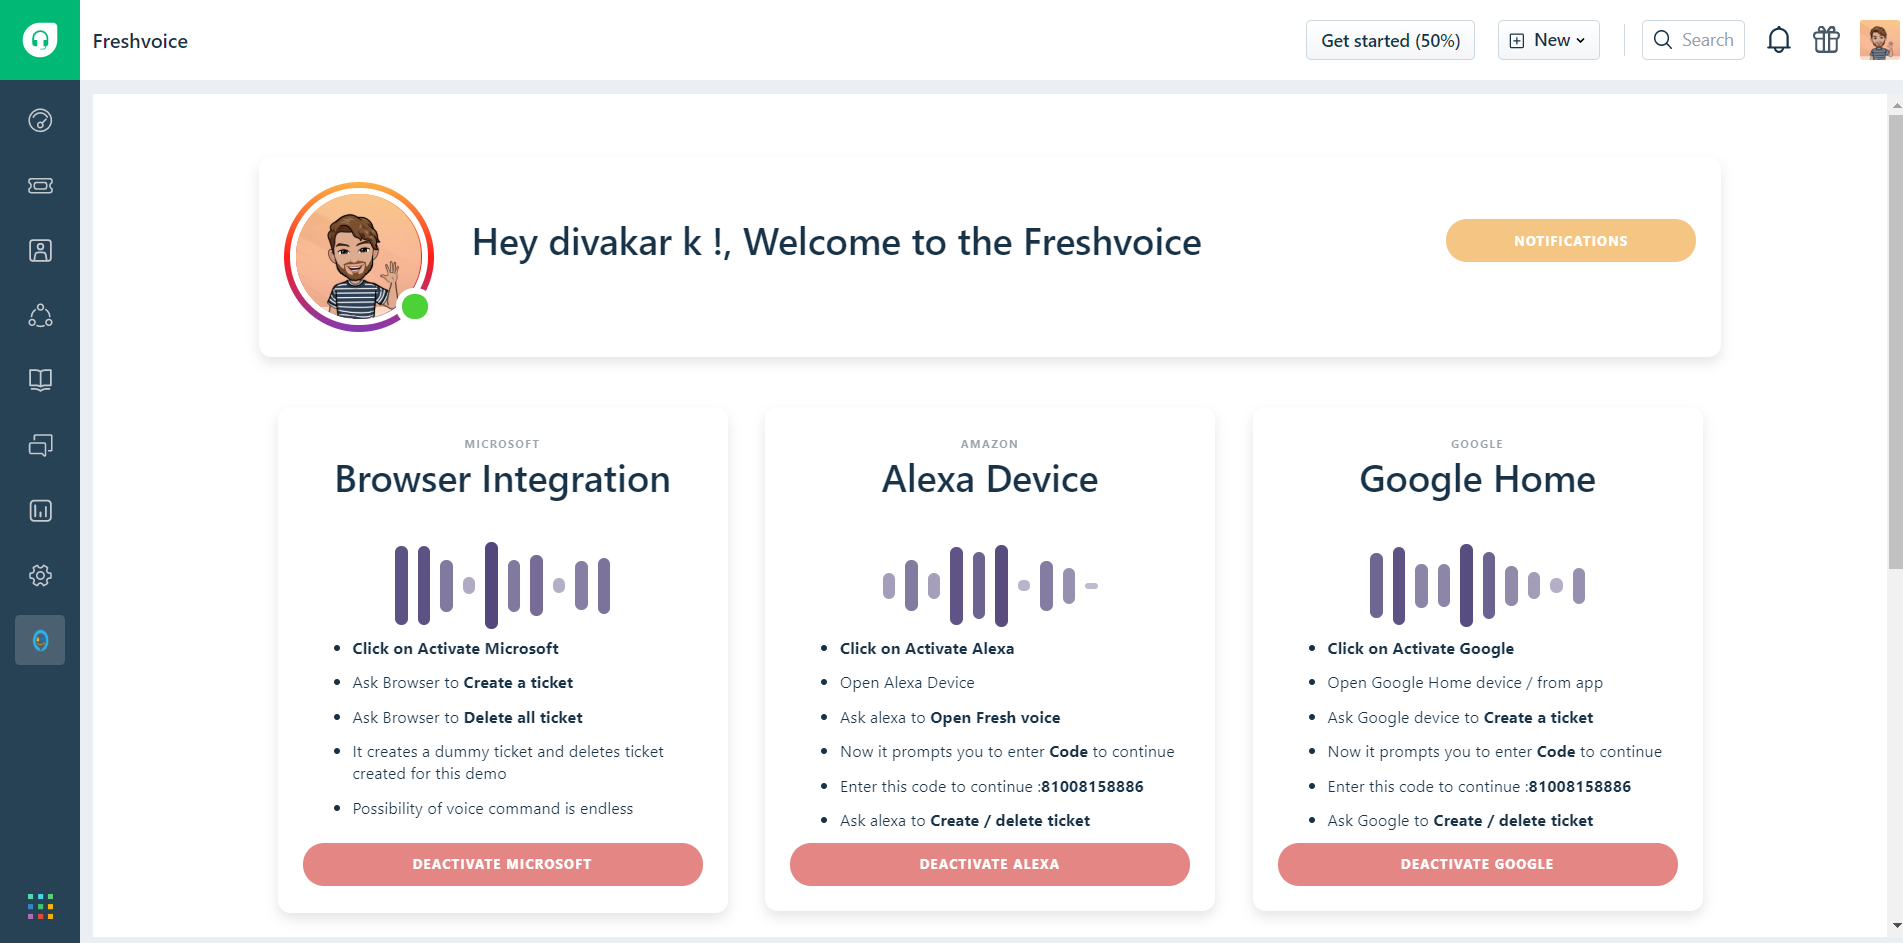 Helpdesk_lennox_india_technology_centre